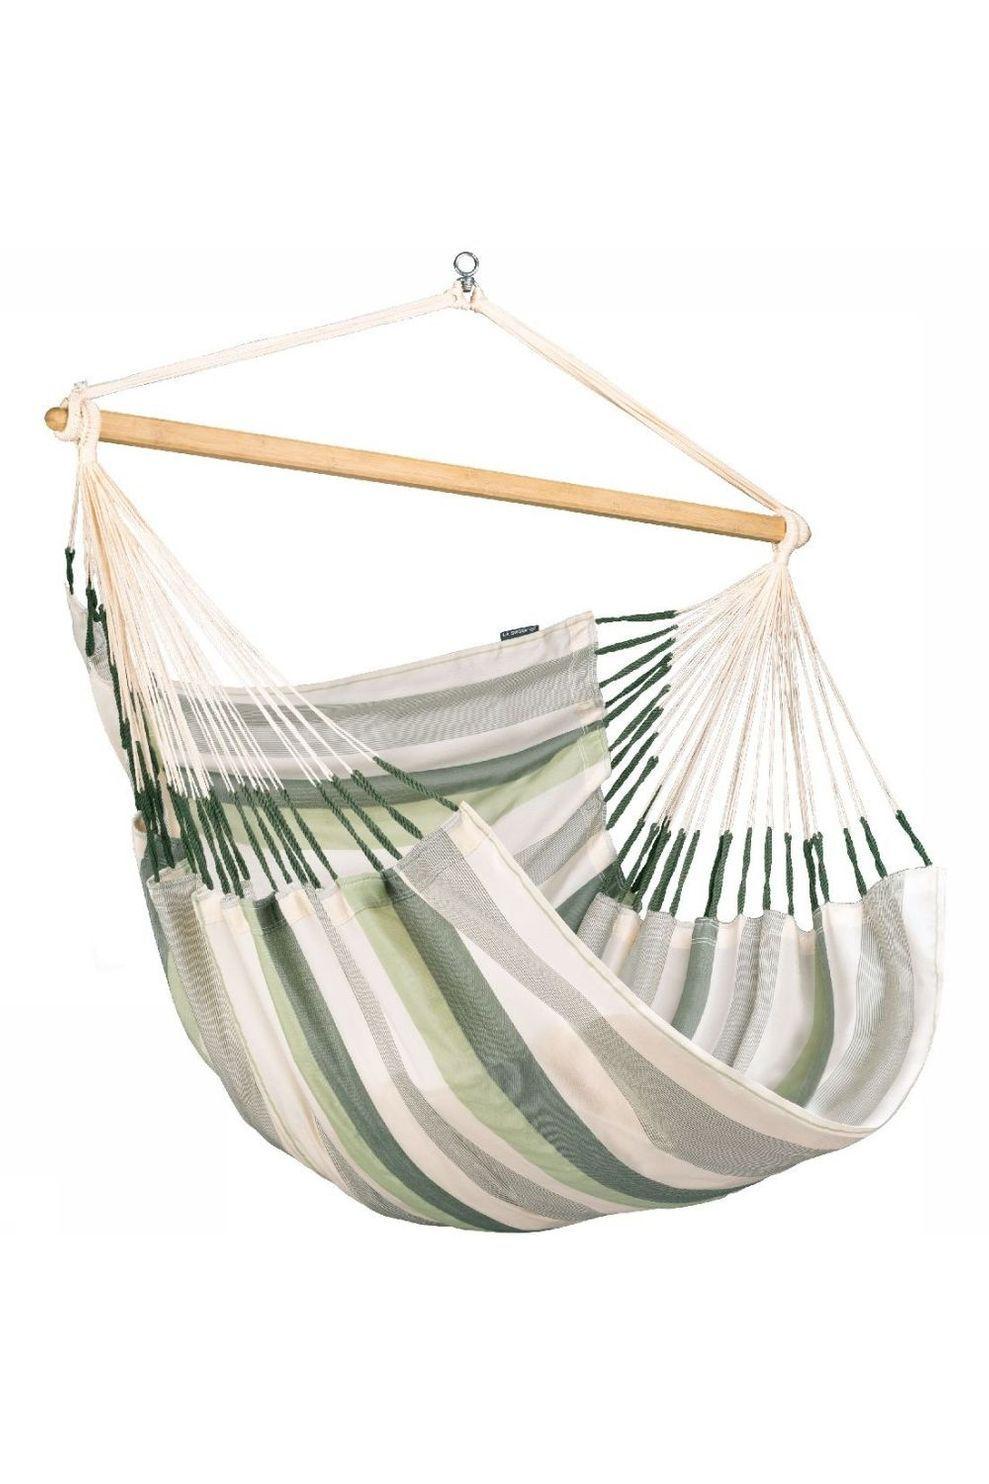 La Siesta Hangmat Domingo Lounger Chair - Groen/ Gemengd